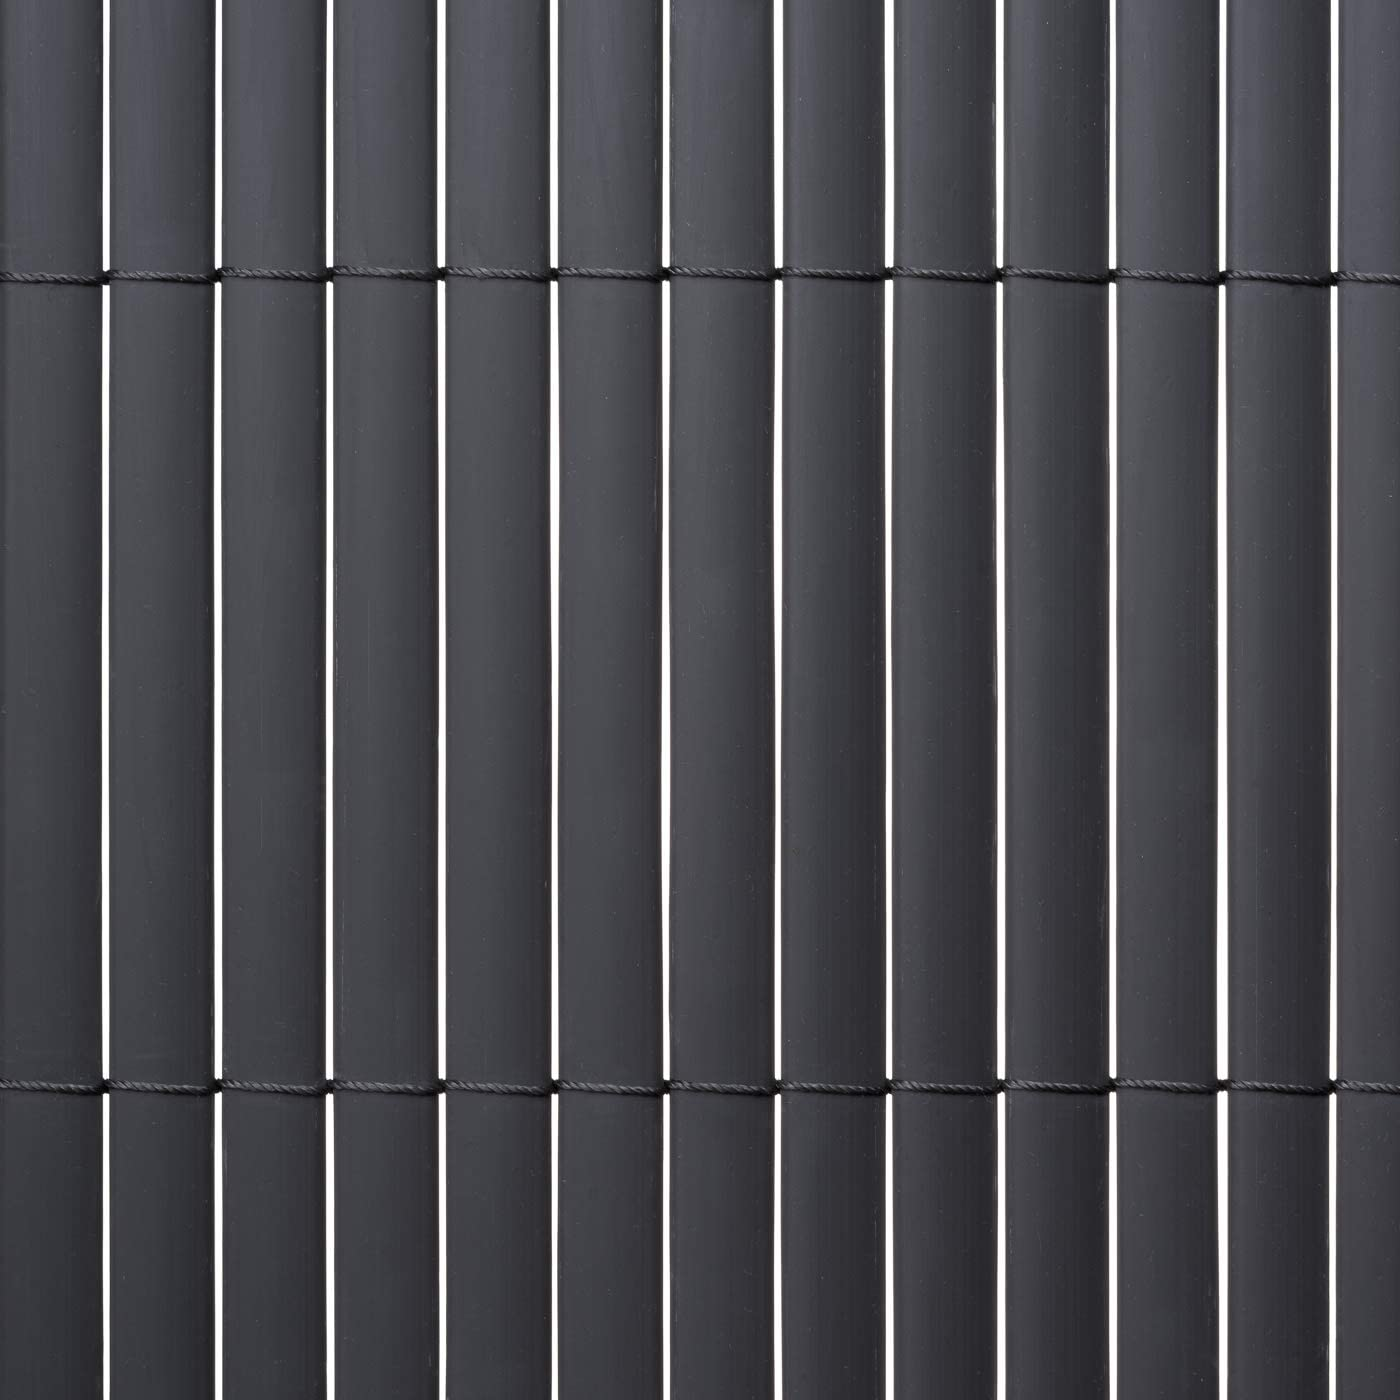 Ventanara Privacy Mat Privacy Screen PVC Privacy Panel Wind Protection for Garden Balcony Patio